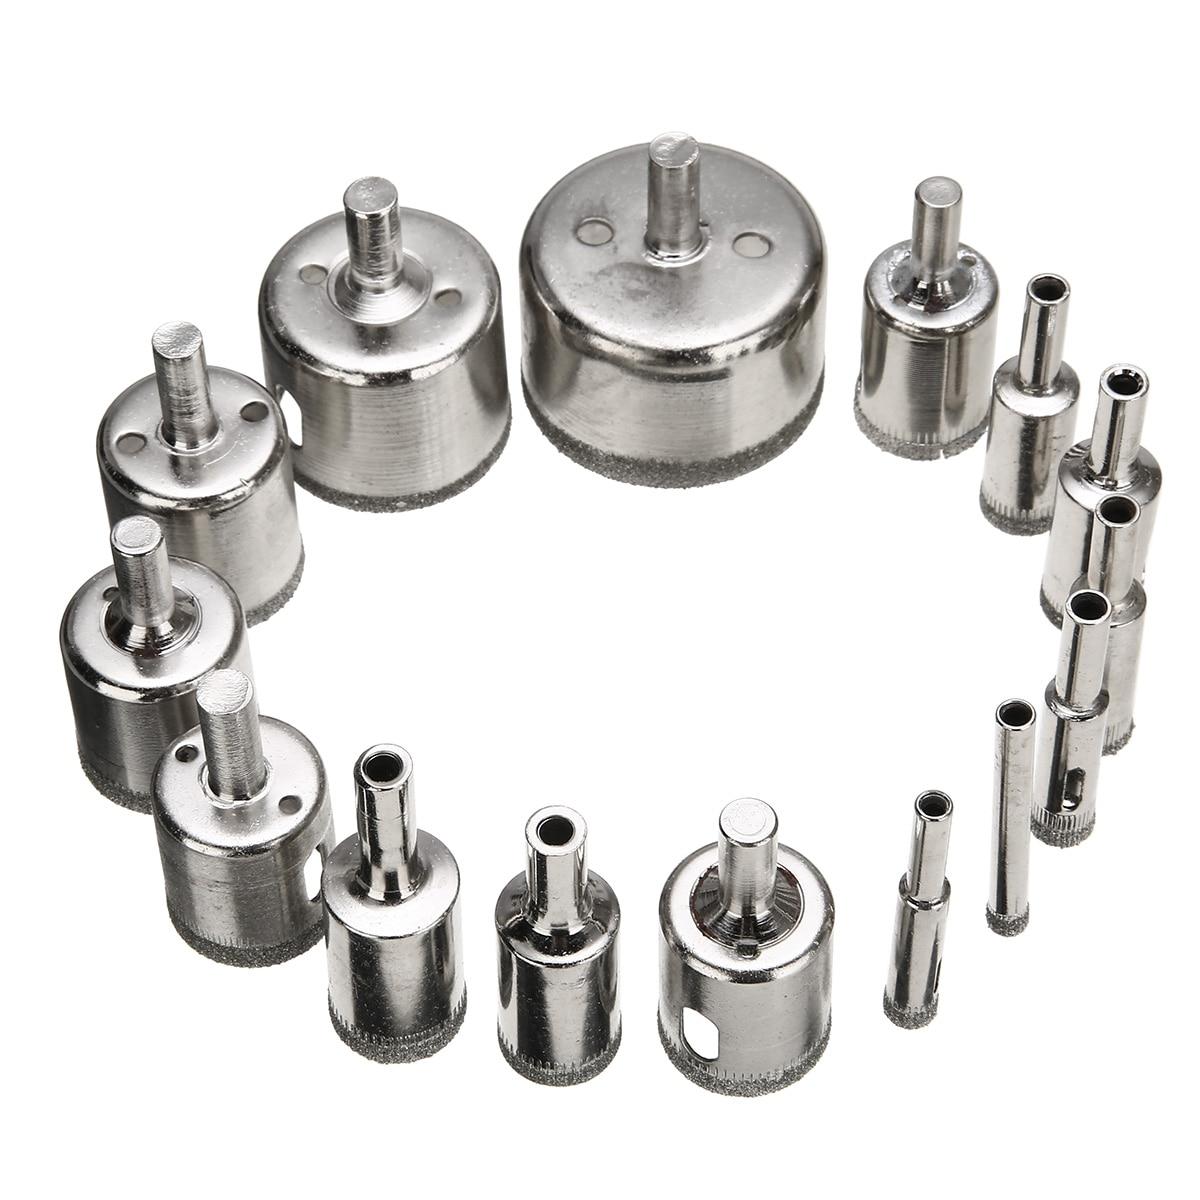 15Pcs/Set Diamond Hole Saw Tile Drill Bits For Glass Ceramic Porcelain Marble Drill Bit 6mm-50mm